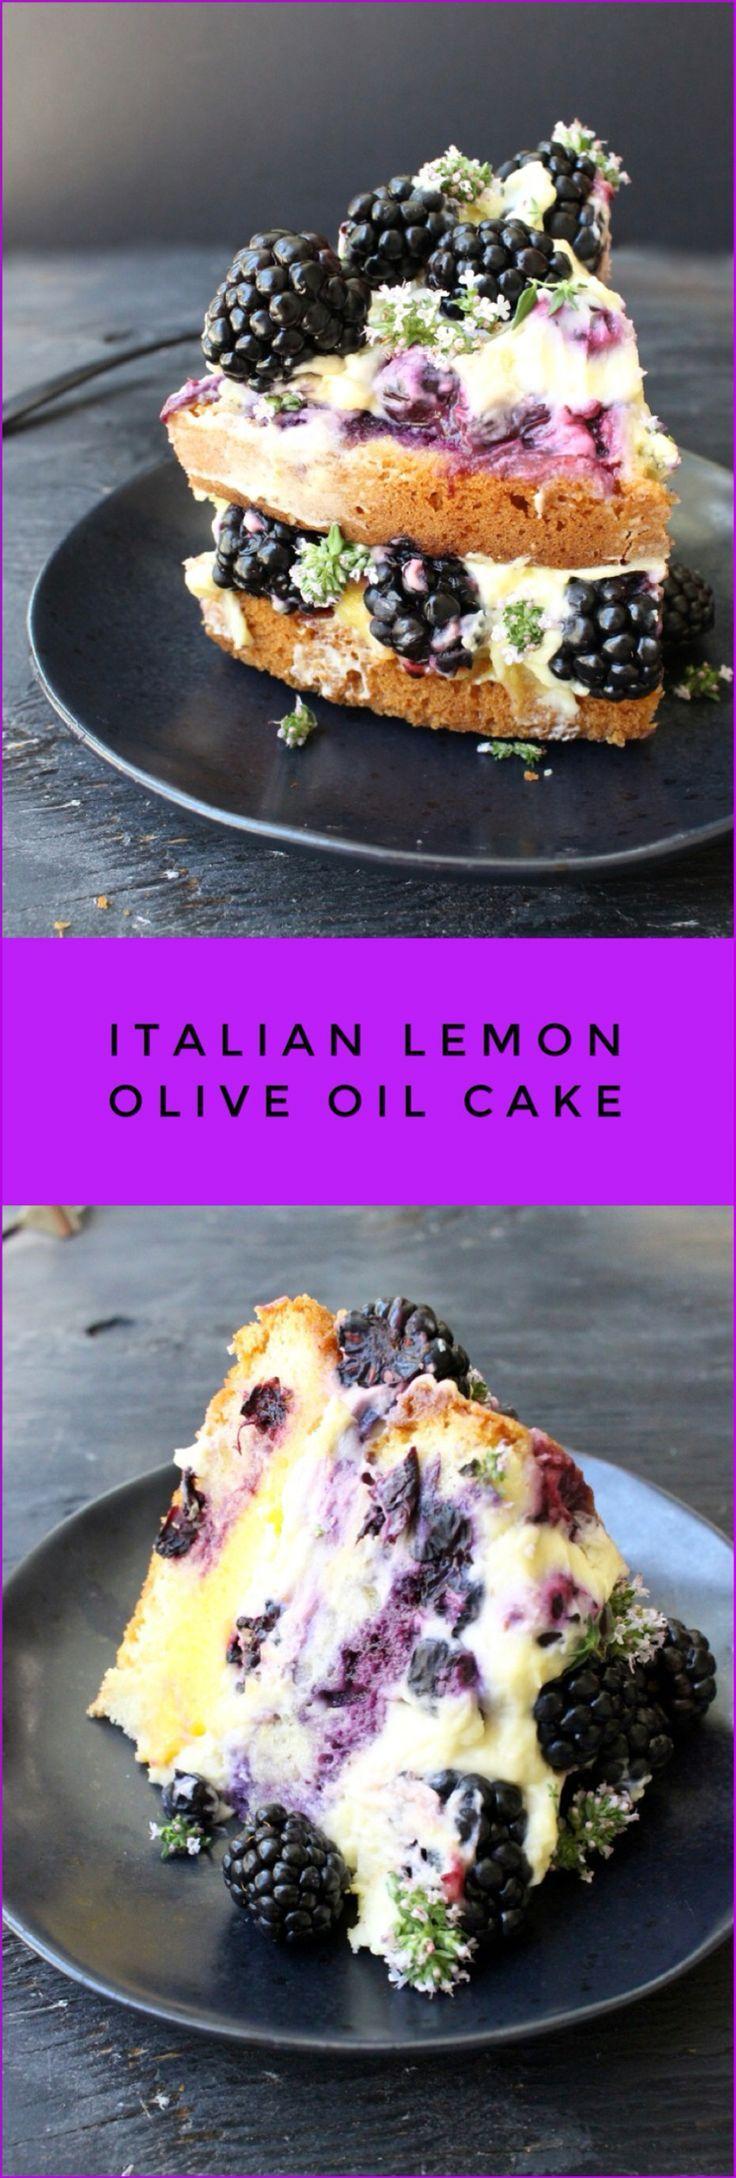 Italian Lemon Olive Oil Cake with Berried Whipped Mascarpone and Lemon Curd Layers | http://CiaoFlorentina.com @CiaoFlorentina